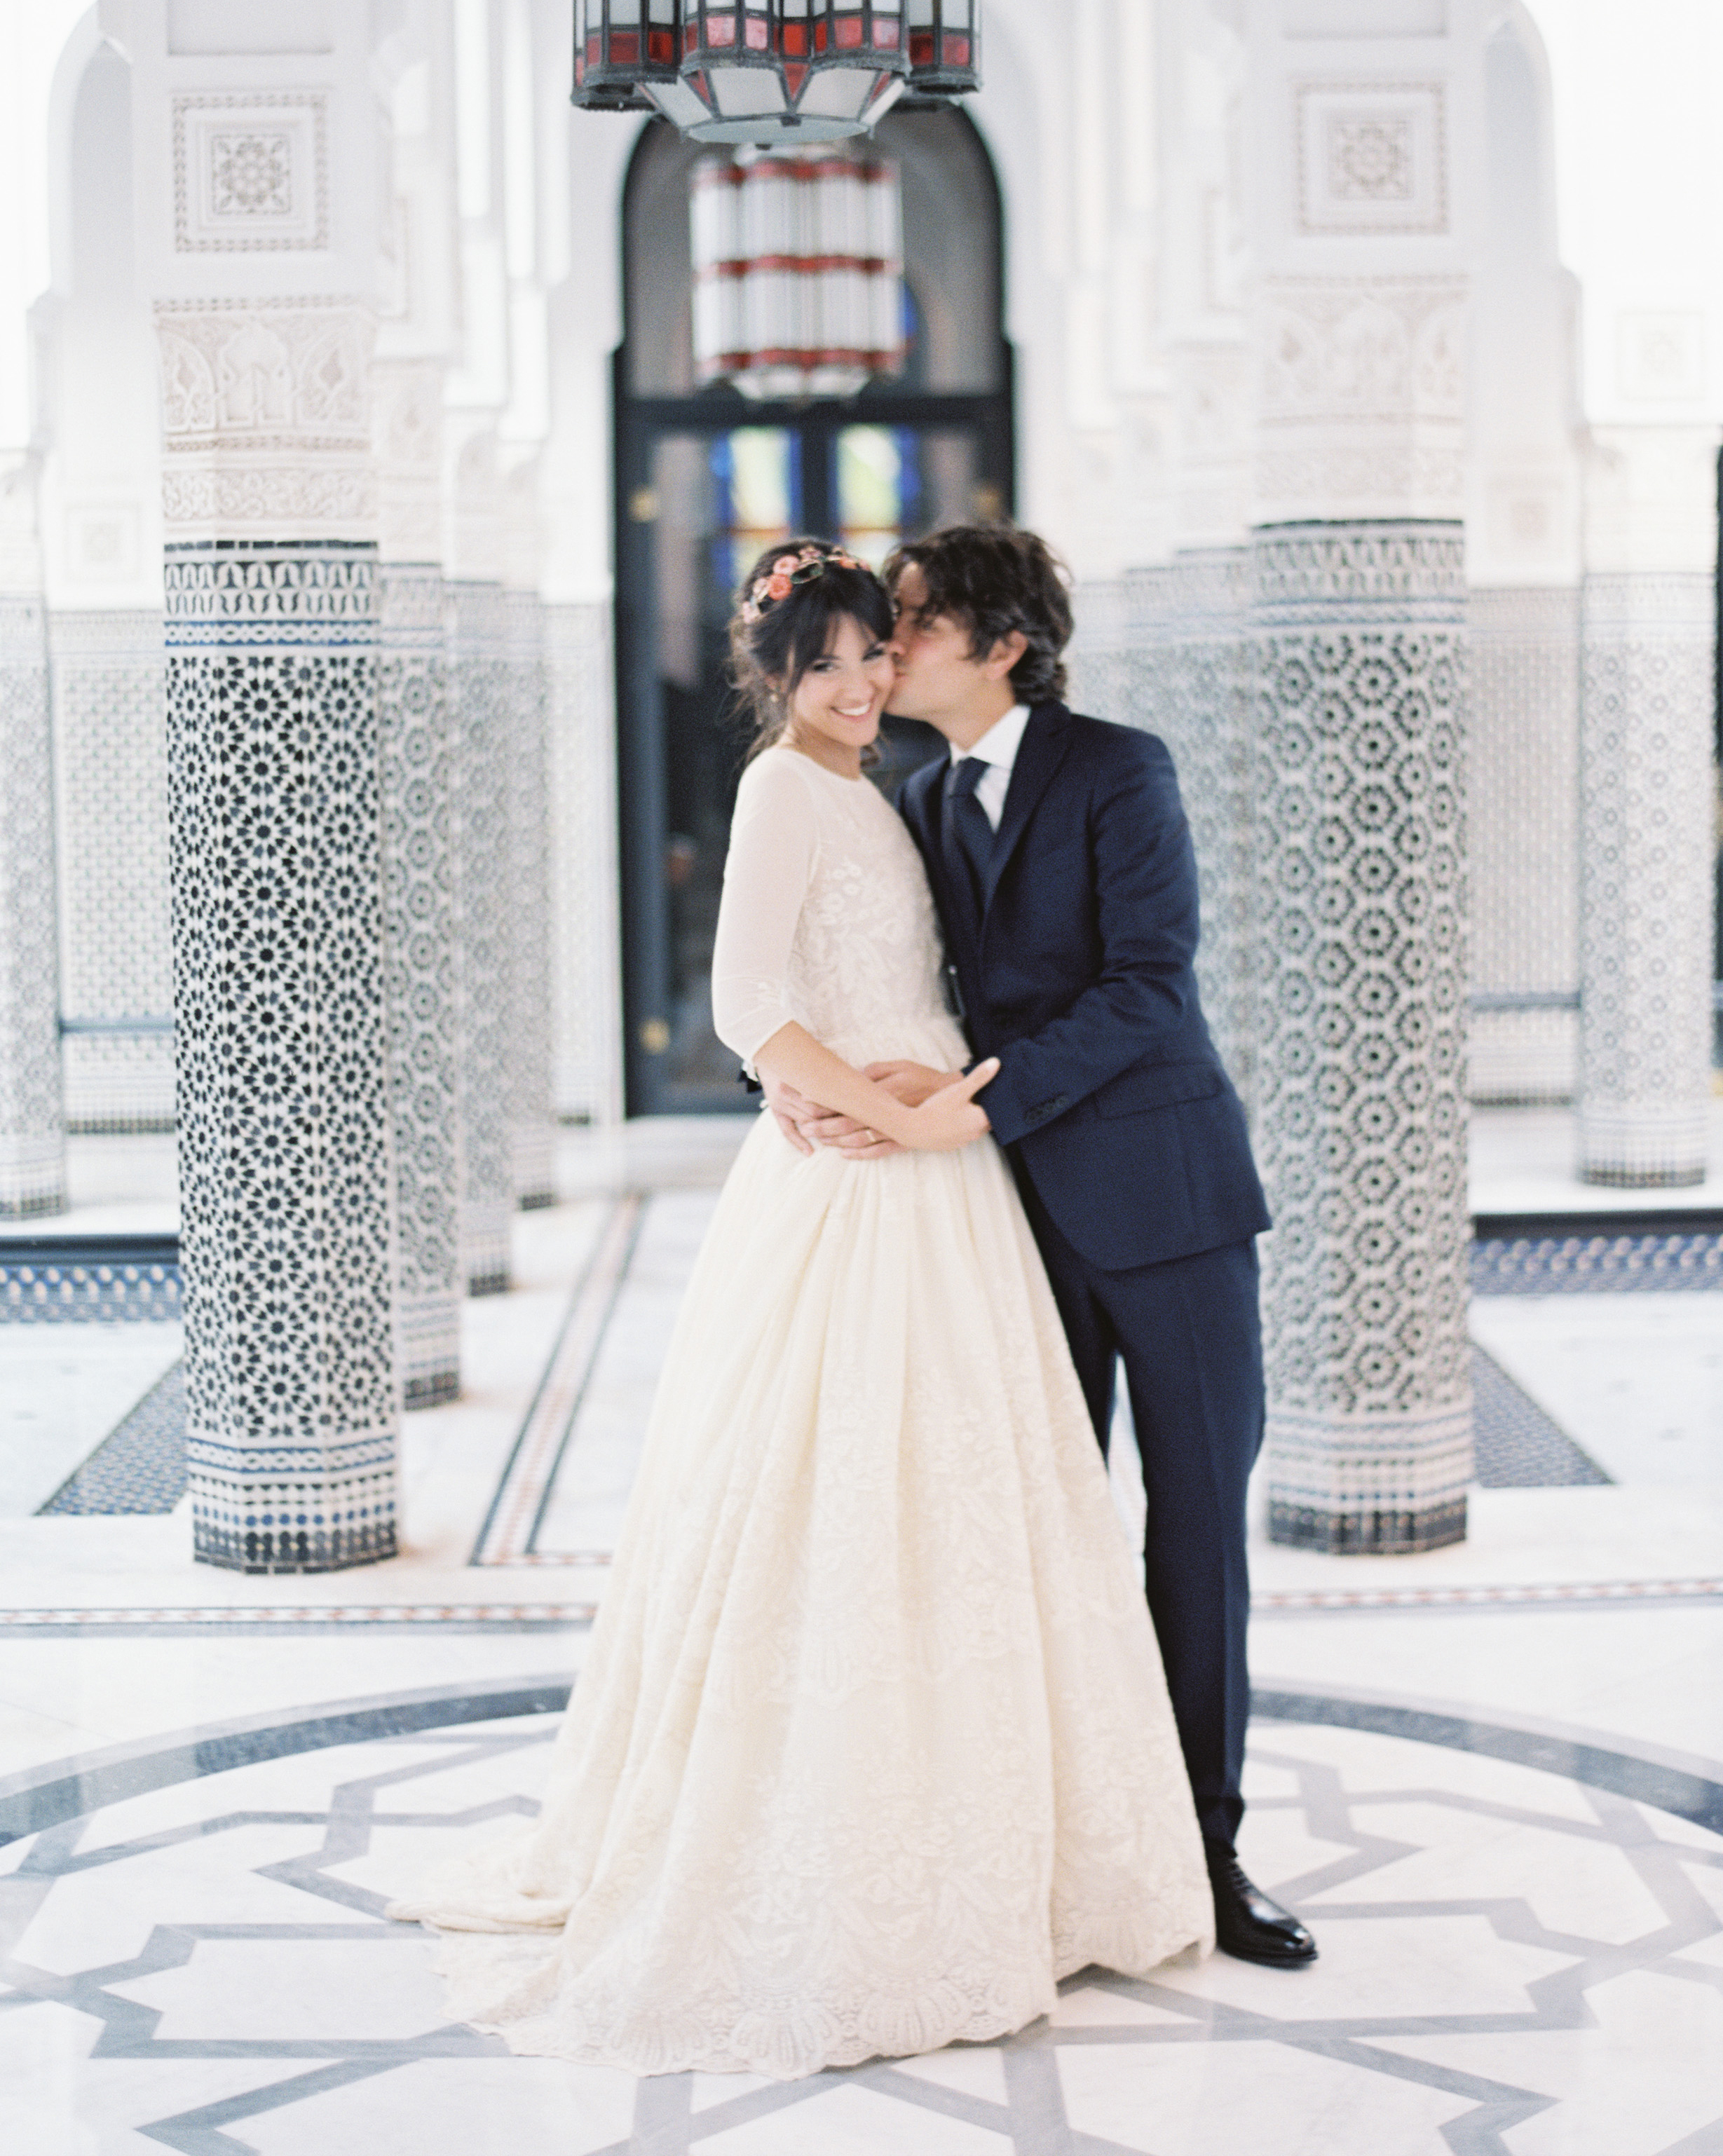 federica-tommaso-wedding-couple-077-s112330-1015.jpg